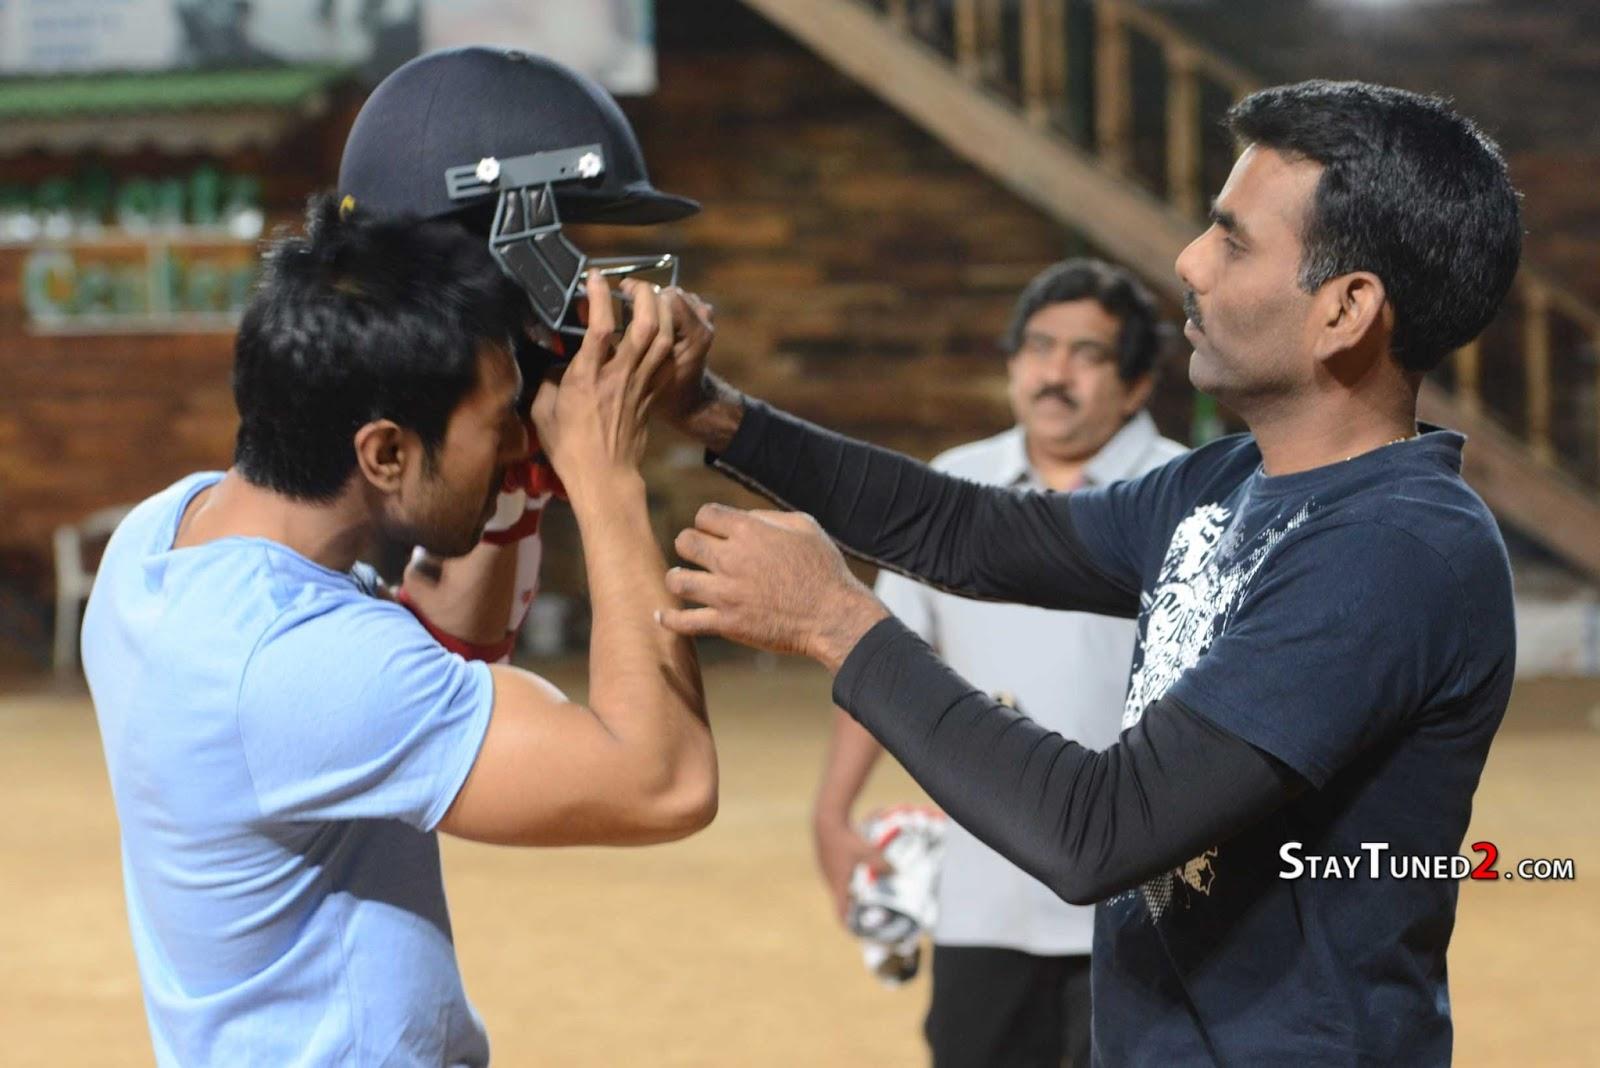 http://4.bp.blogspot.com/-2-_W4wOhHwg/URNNN2FHHKI/AAAAAAAAFQE/fEOb1a-iSCY/s1600/Telugu-Warriors-Practicing-For-CCL-3-At-In-Sportz-Stadium-18.jpg